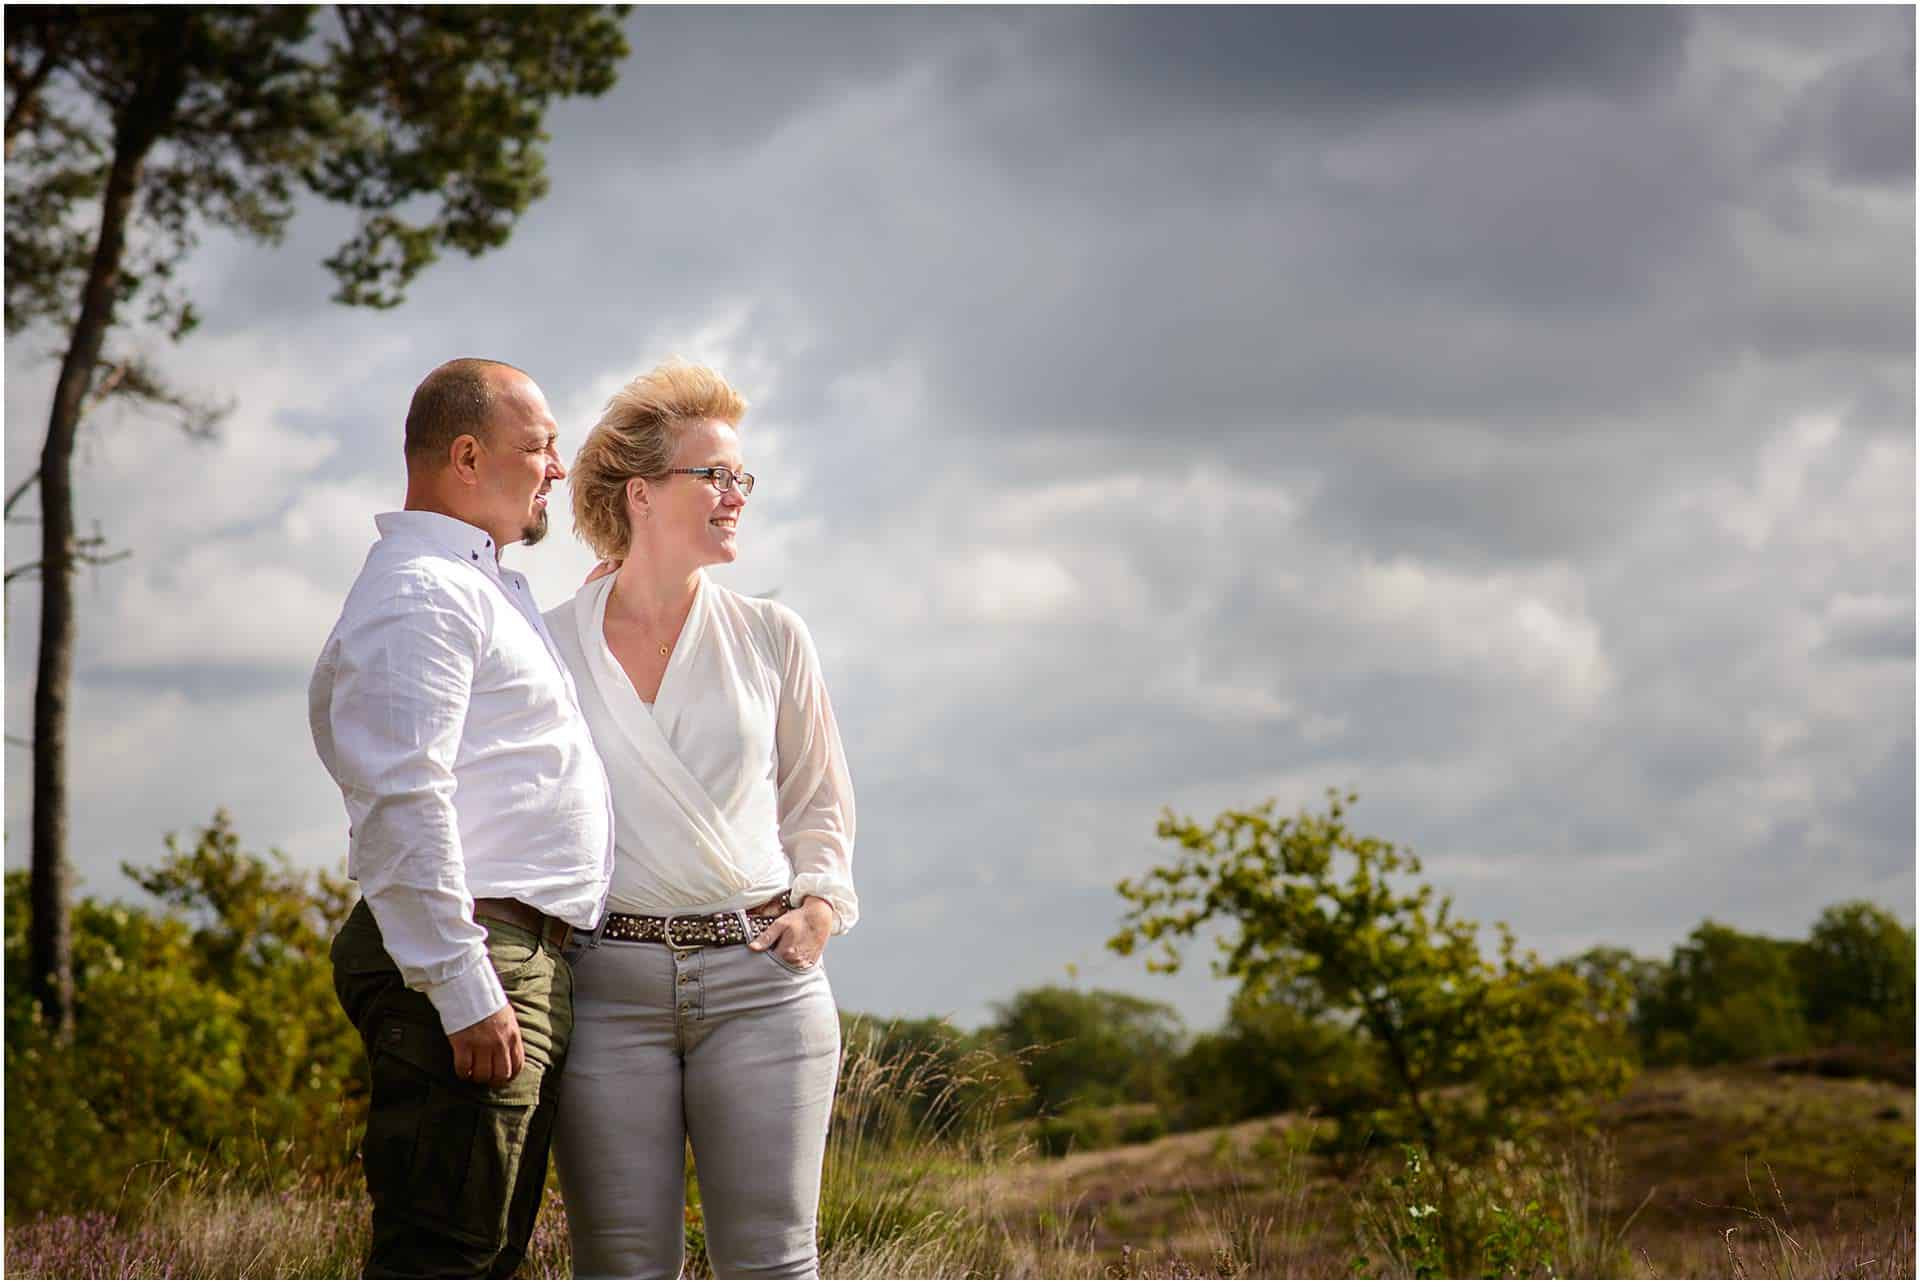 2017,Haterdse Vennen,Joren & Nienke,Joren & Nienke Janssen-Meijering,Loveshoot,Nijmegen,Overassels,Pre wedding,storm,